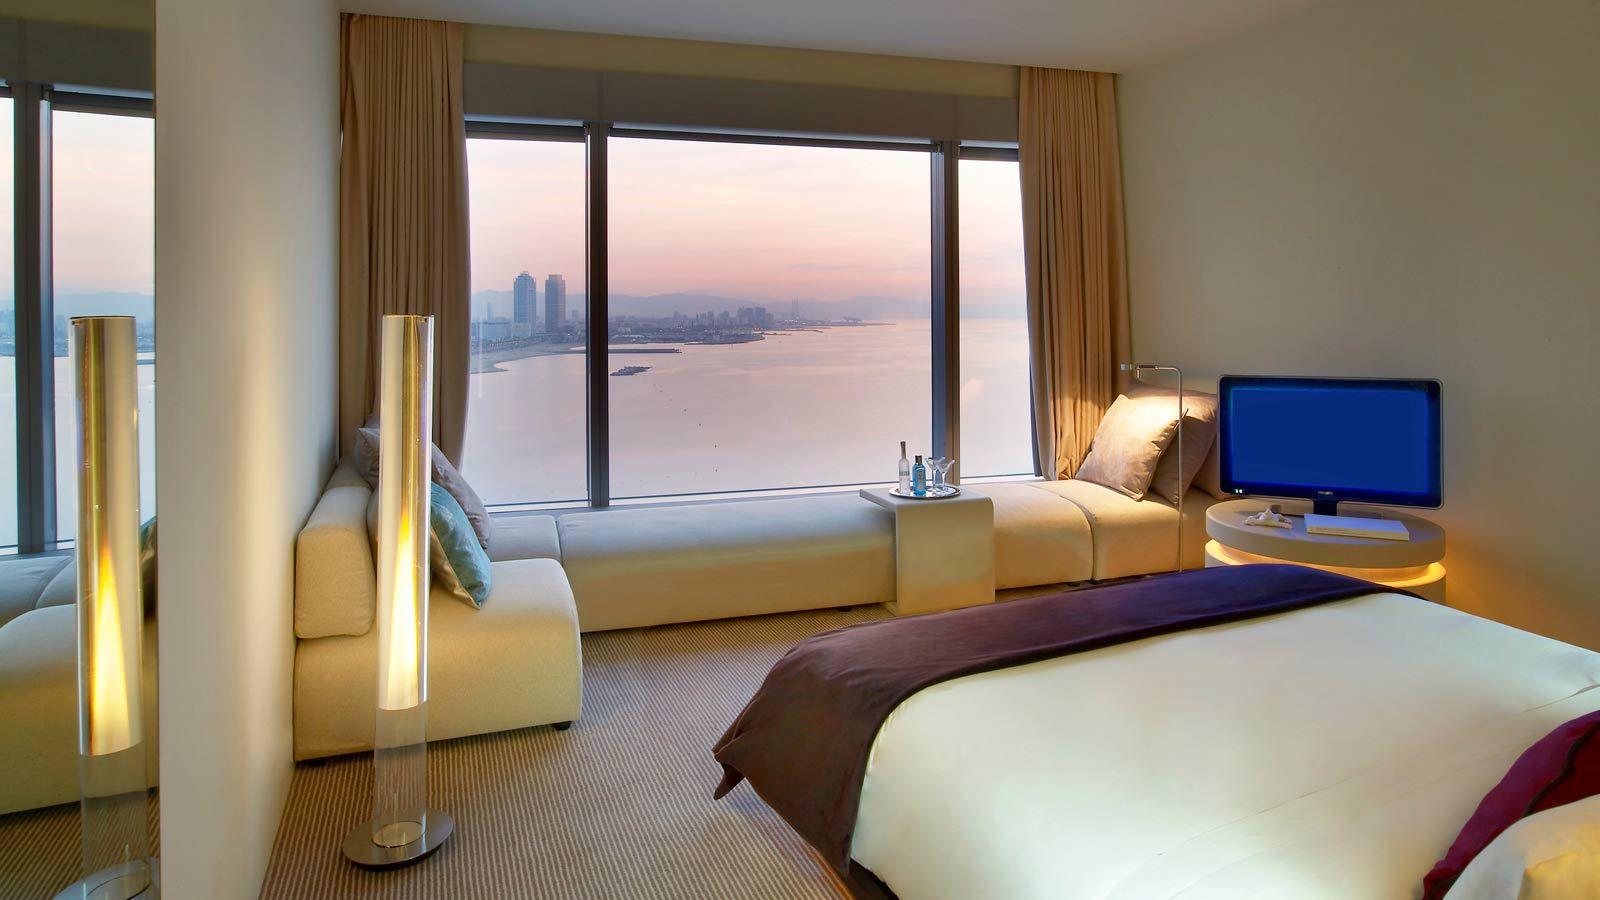 W Hotel Starwood Barcelona Habitacion Madrid Habitaciones De